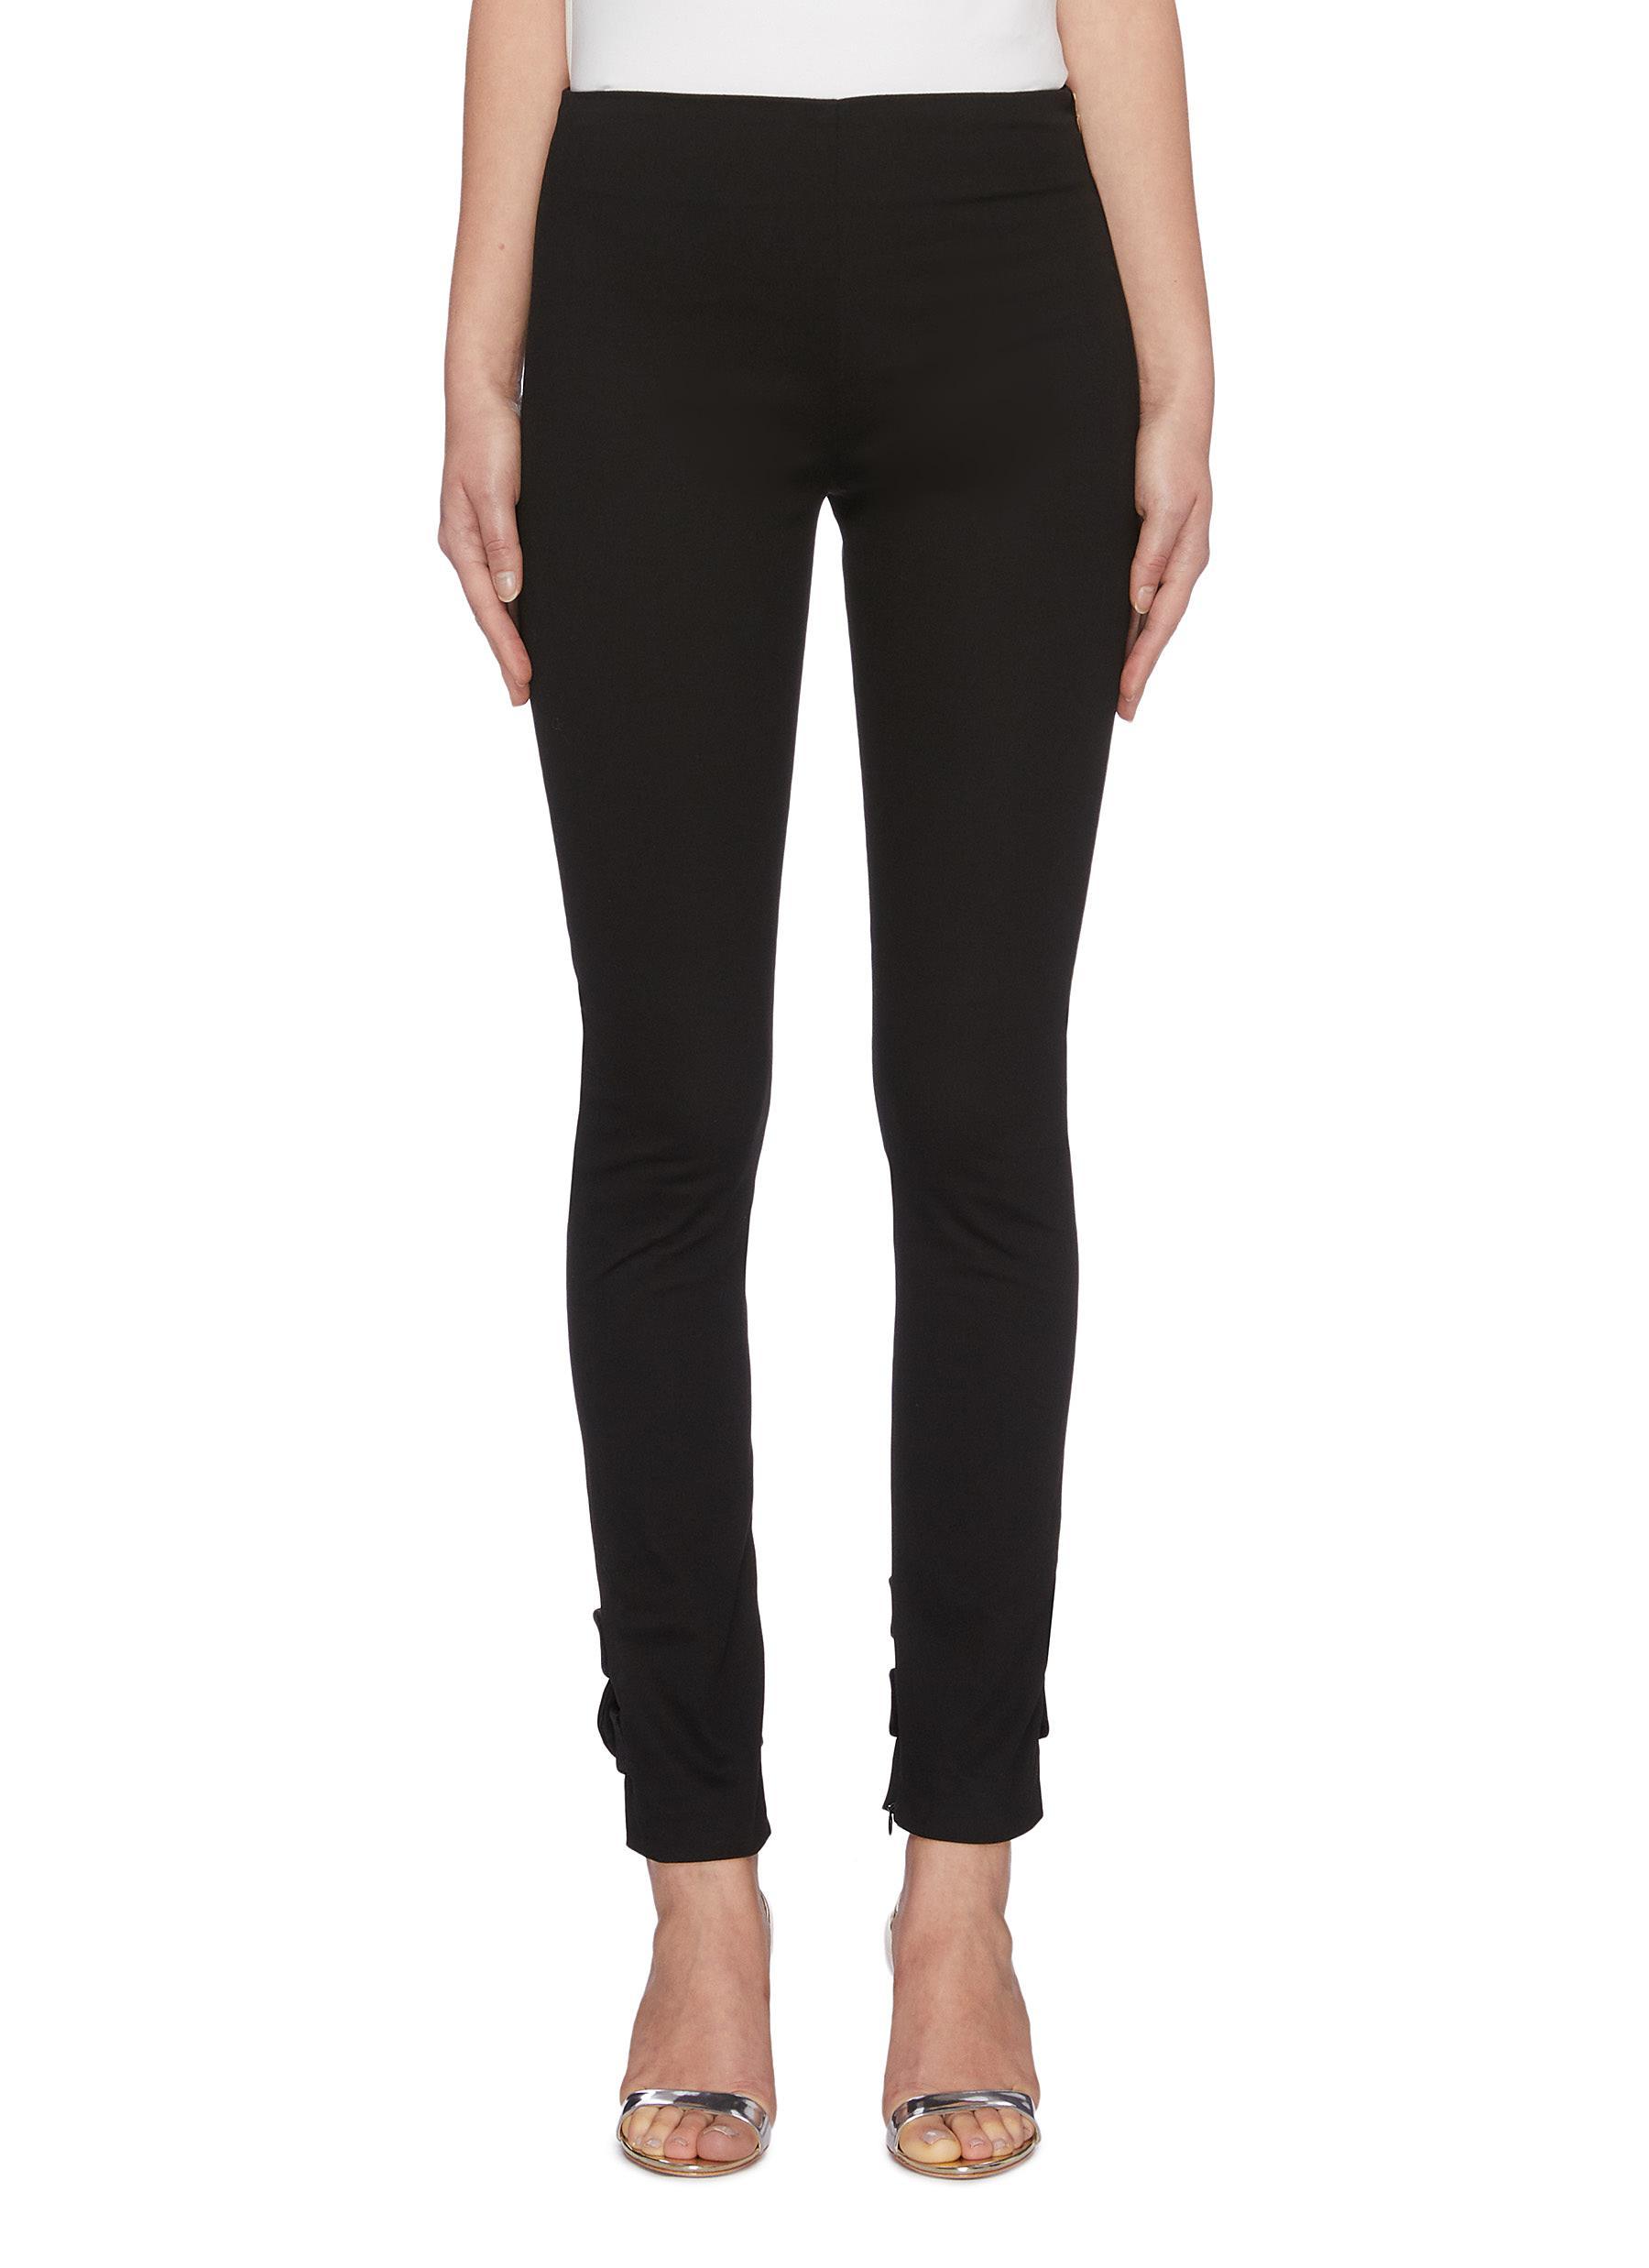 Infinito velvet twist cuff skinny pants by Leal Daccarett